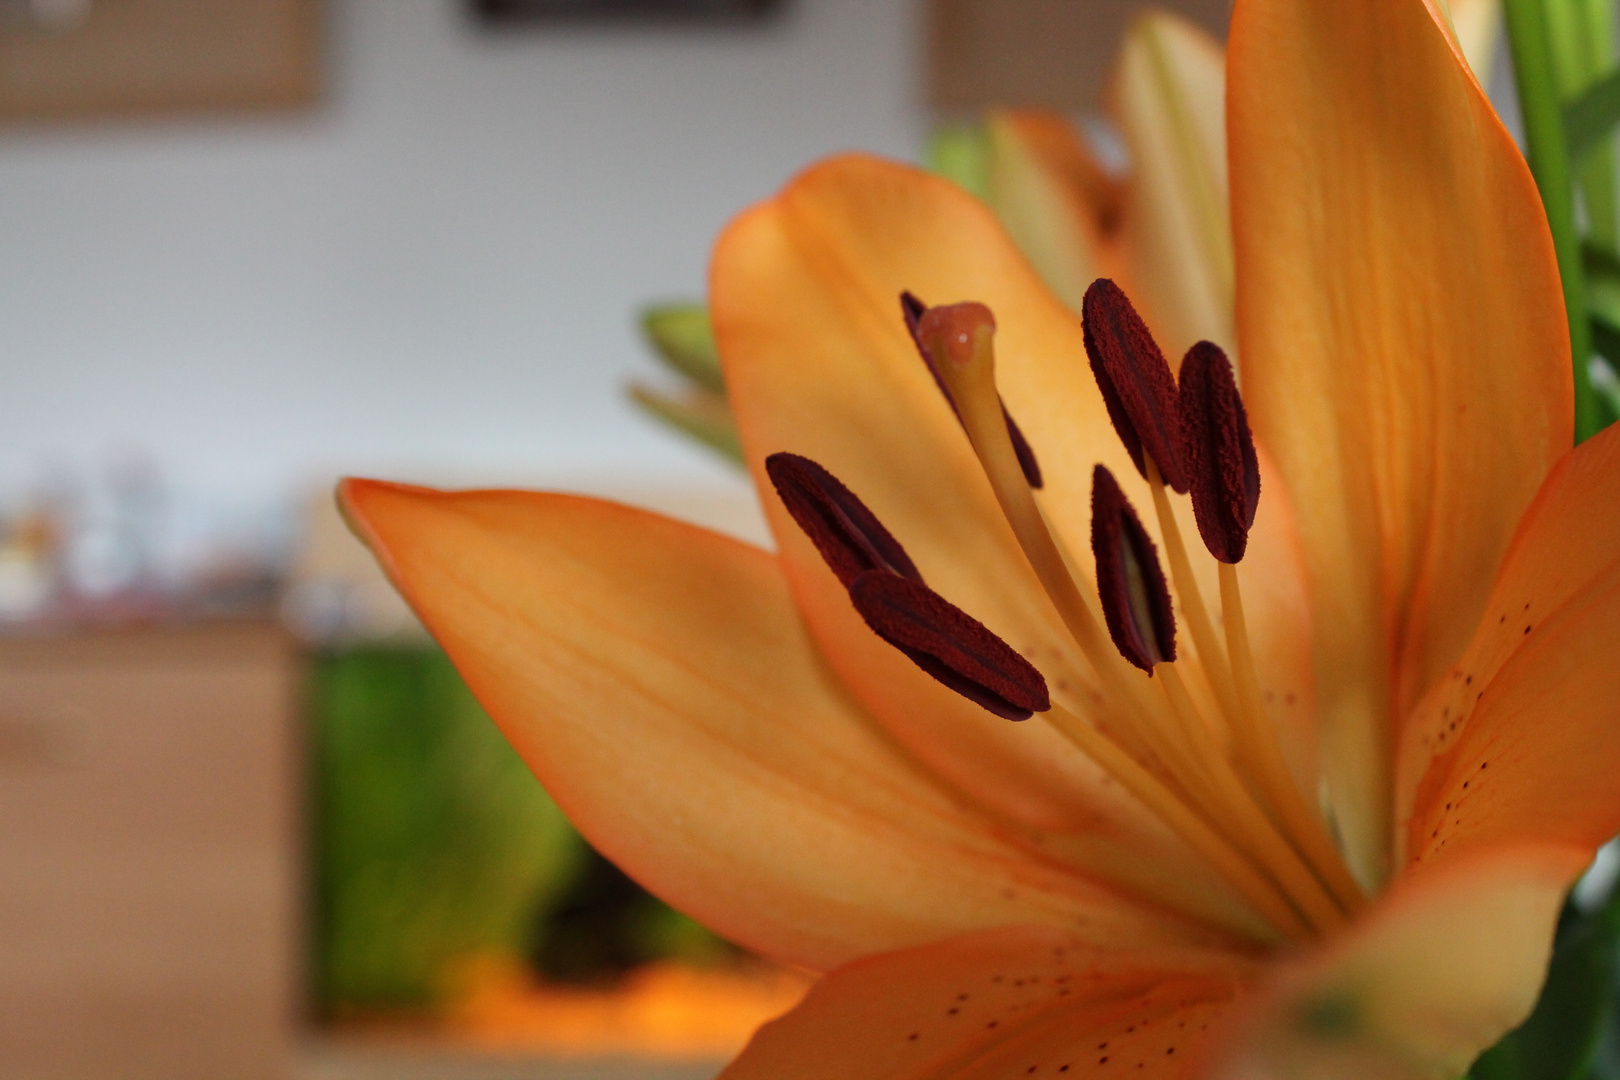 I Love this Flower